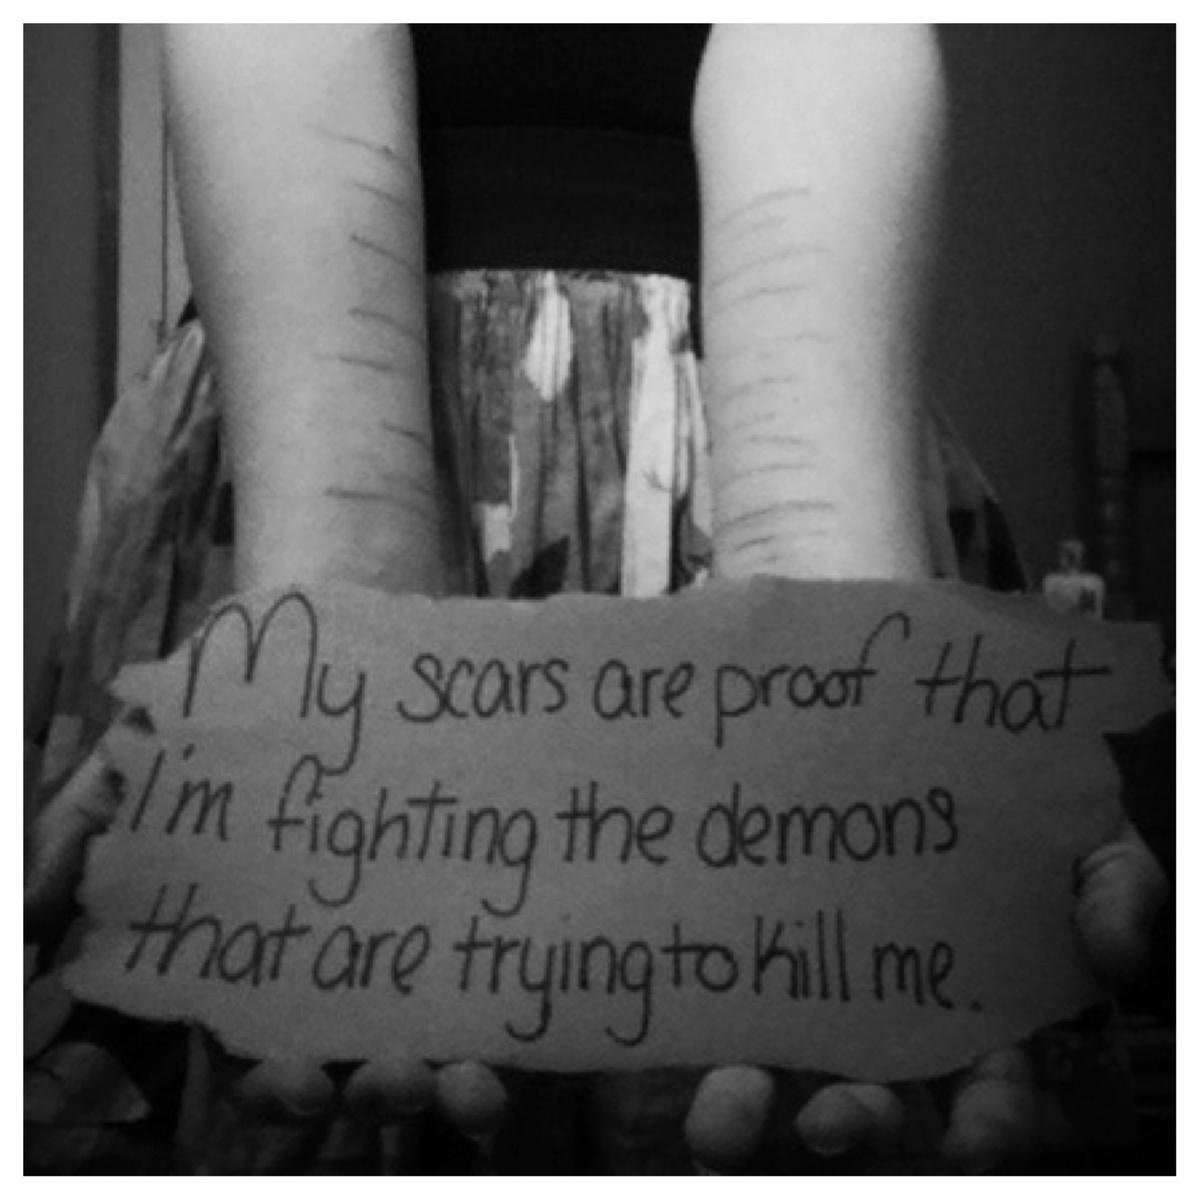 ... self harm depression suicide harm depression suicidal harm recovery